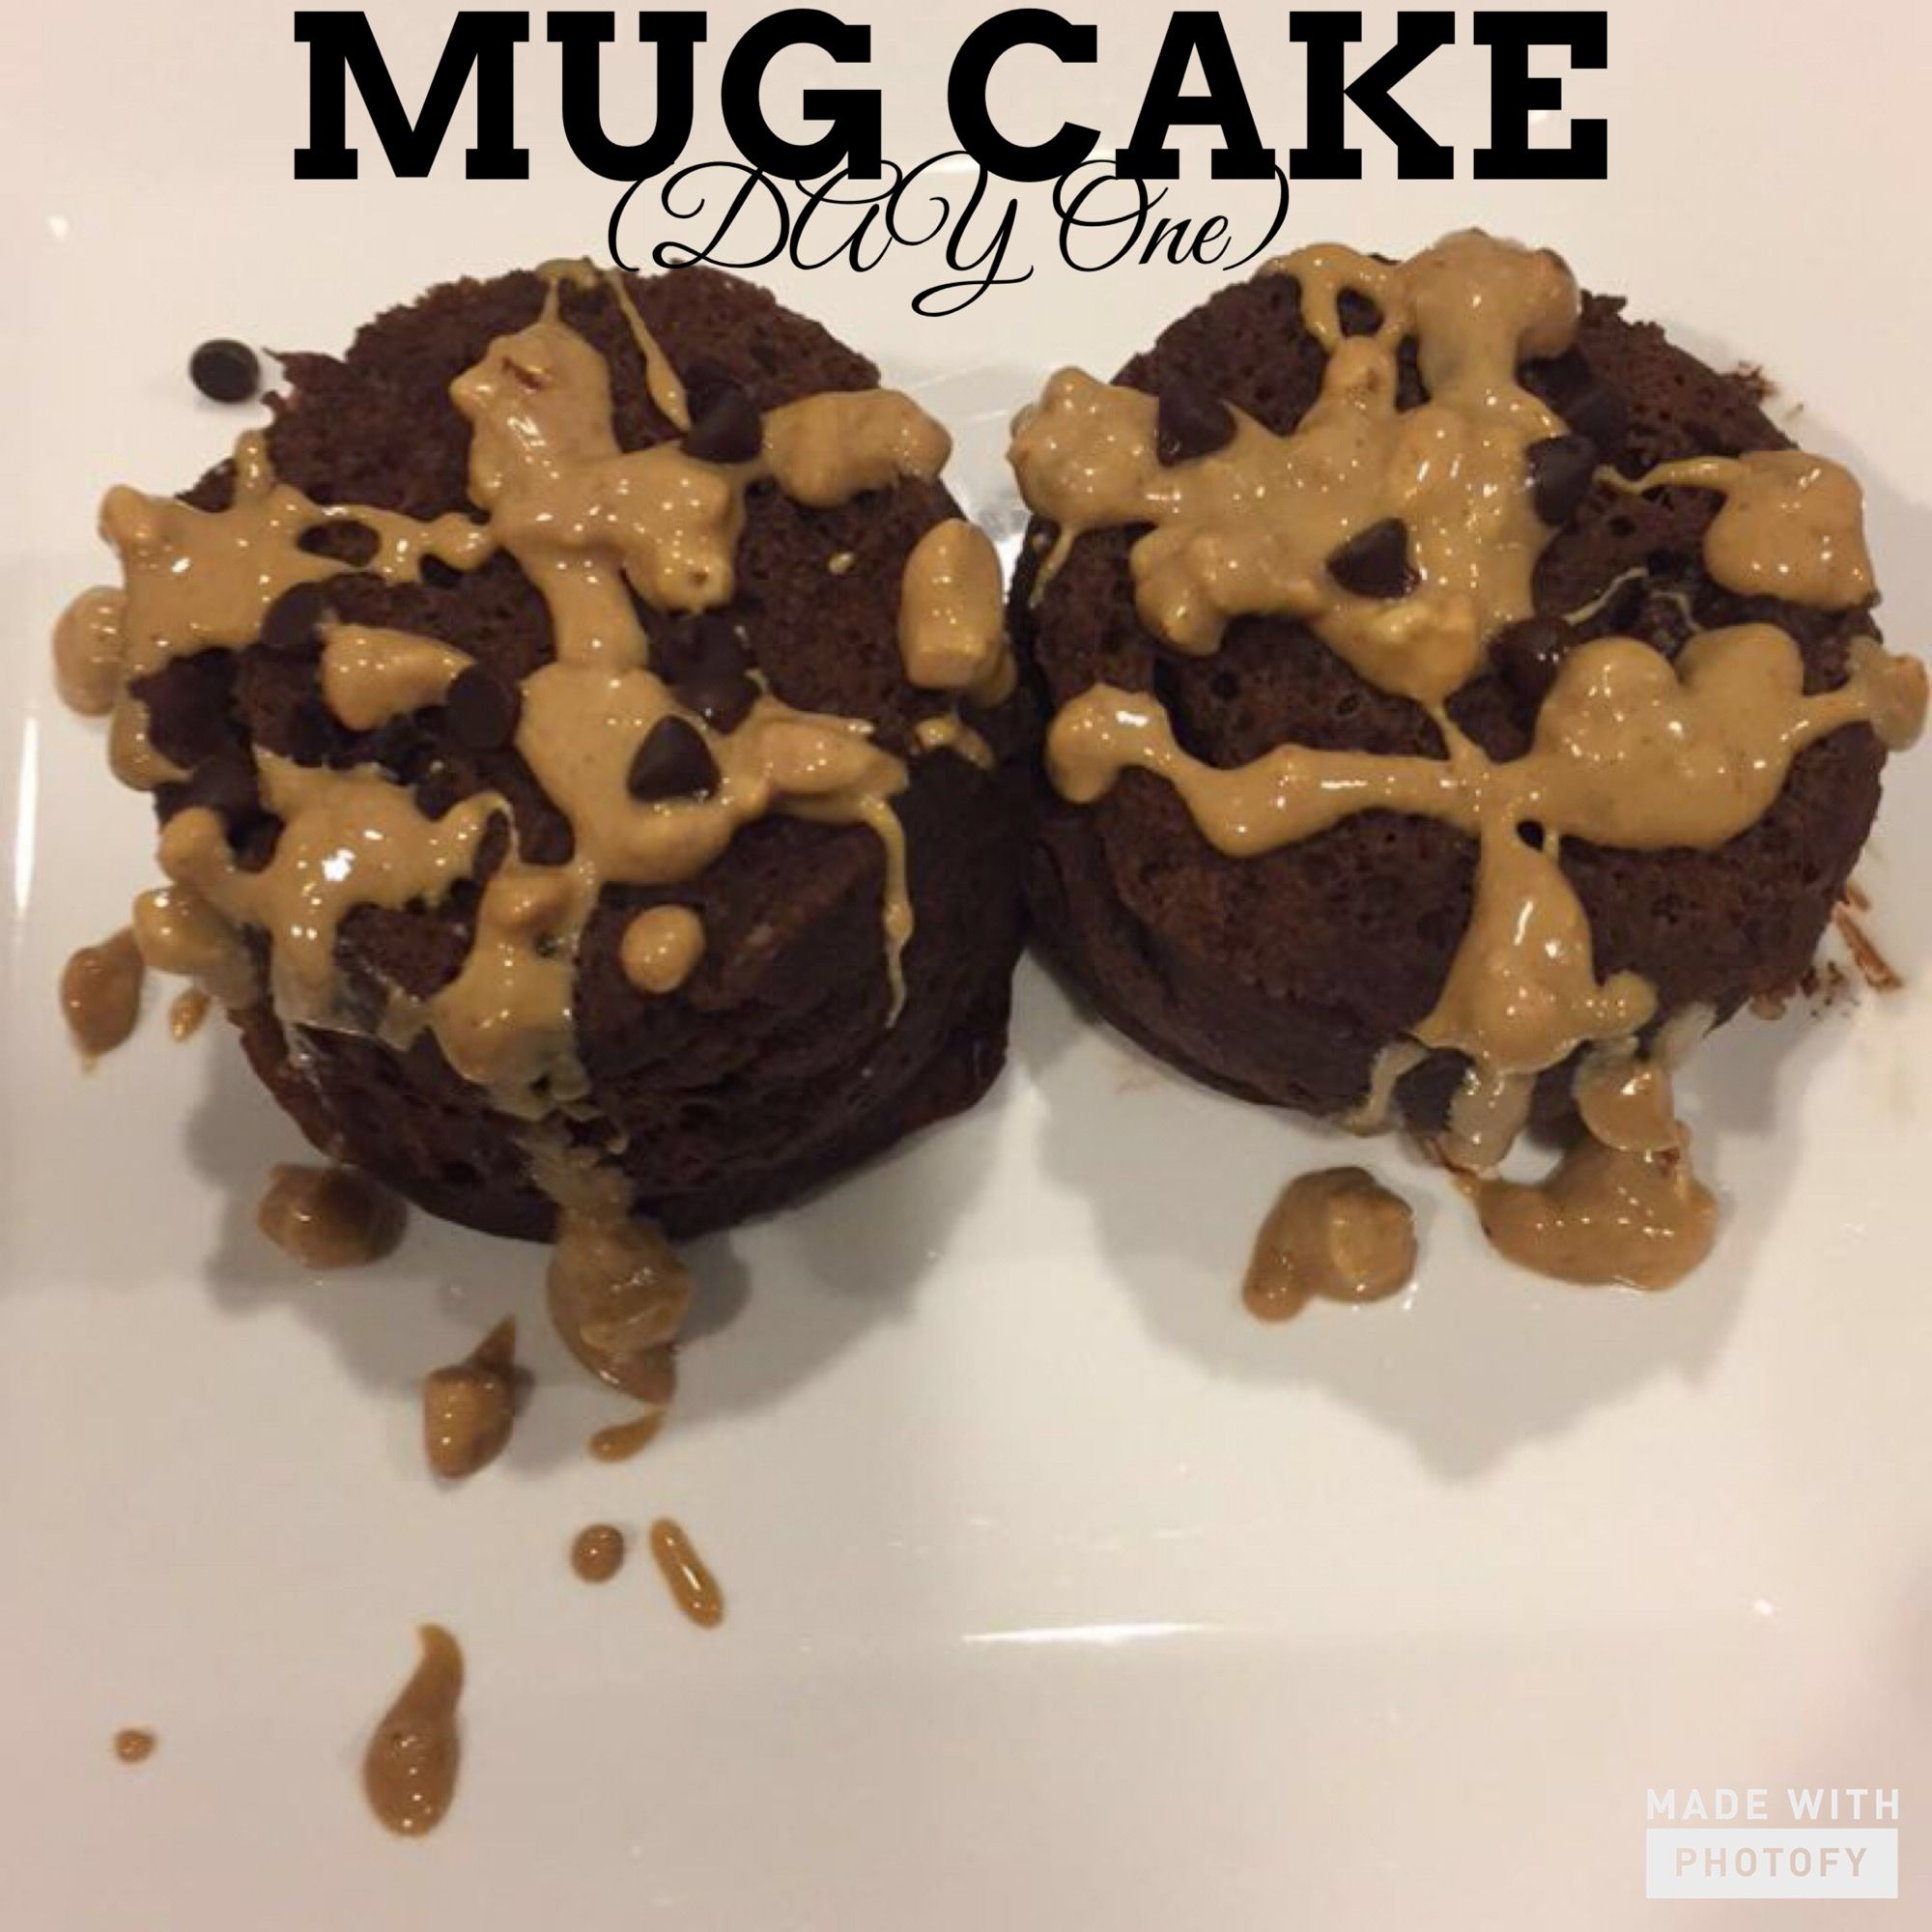 Pin by Katelyn Kichta on Herbalife | Mug cake, Desserts, Food